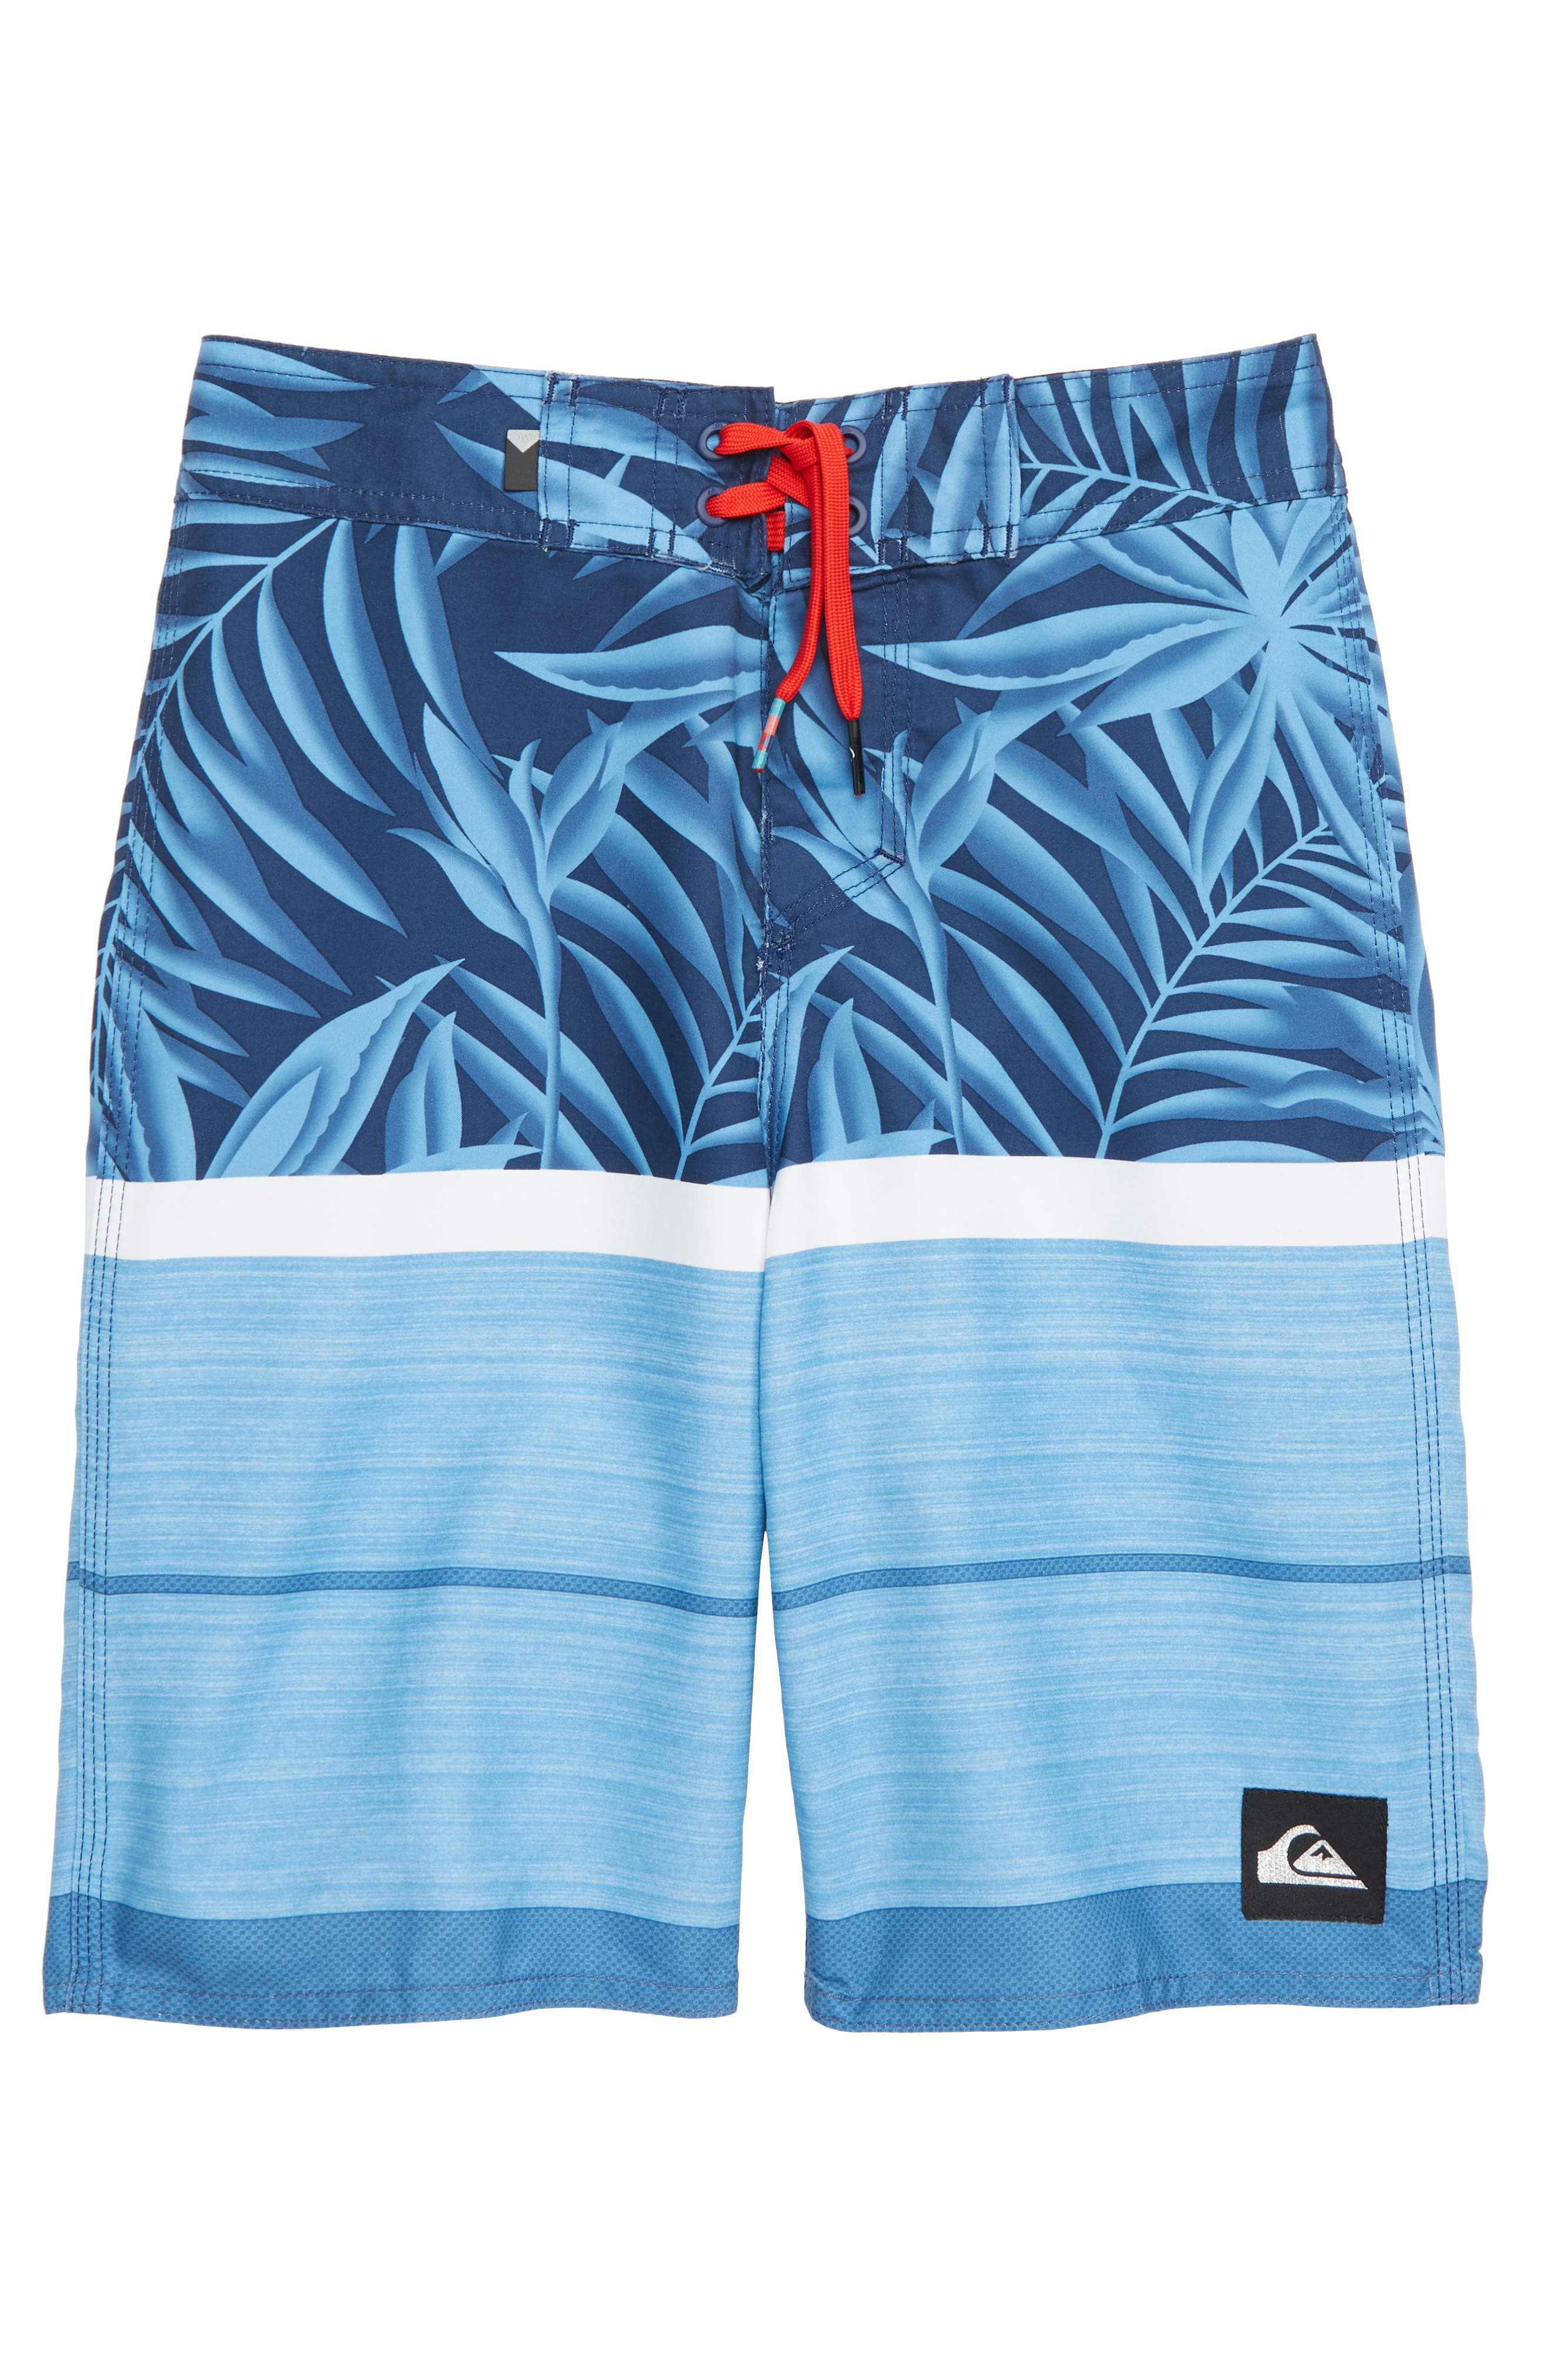 Slab Island Print Board Shorts,                             Main thumbnail 1, color,                             MEDIEVEL BLUE